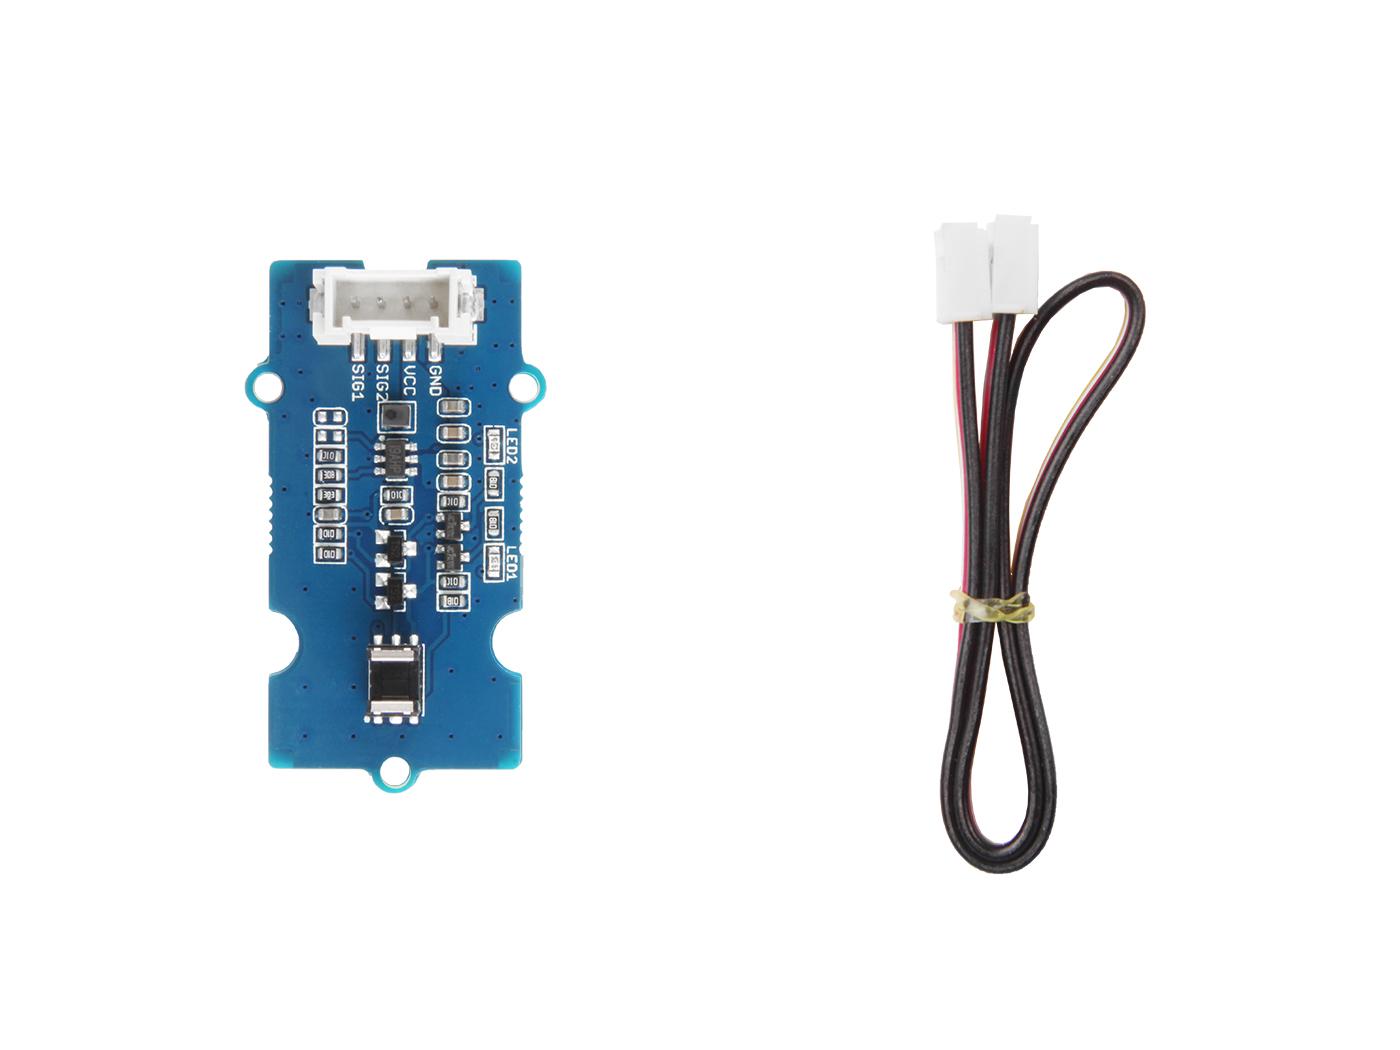 Grove - Optical Rotary Encoder(TCUT1600X01)